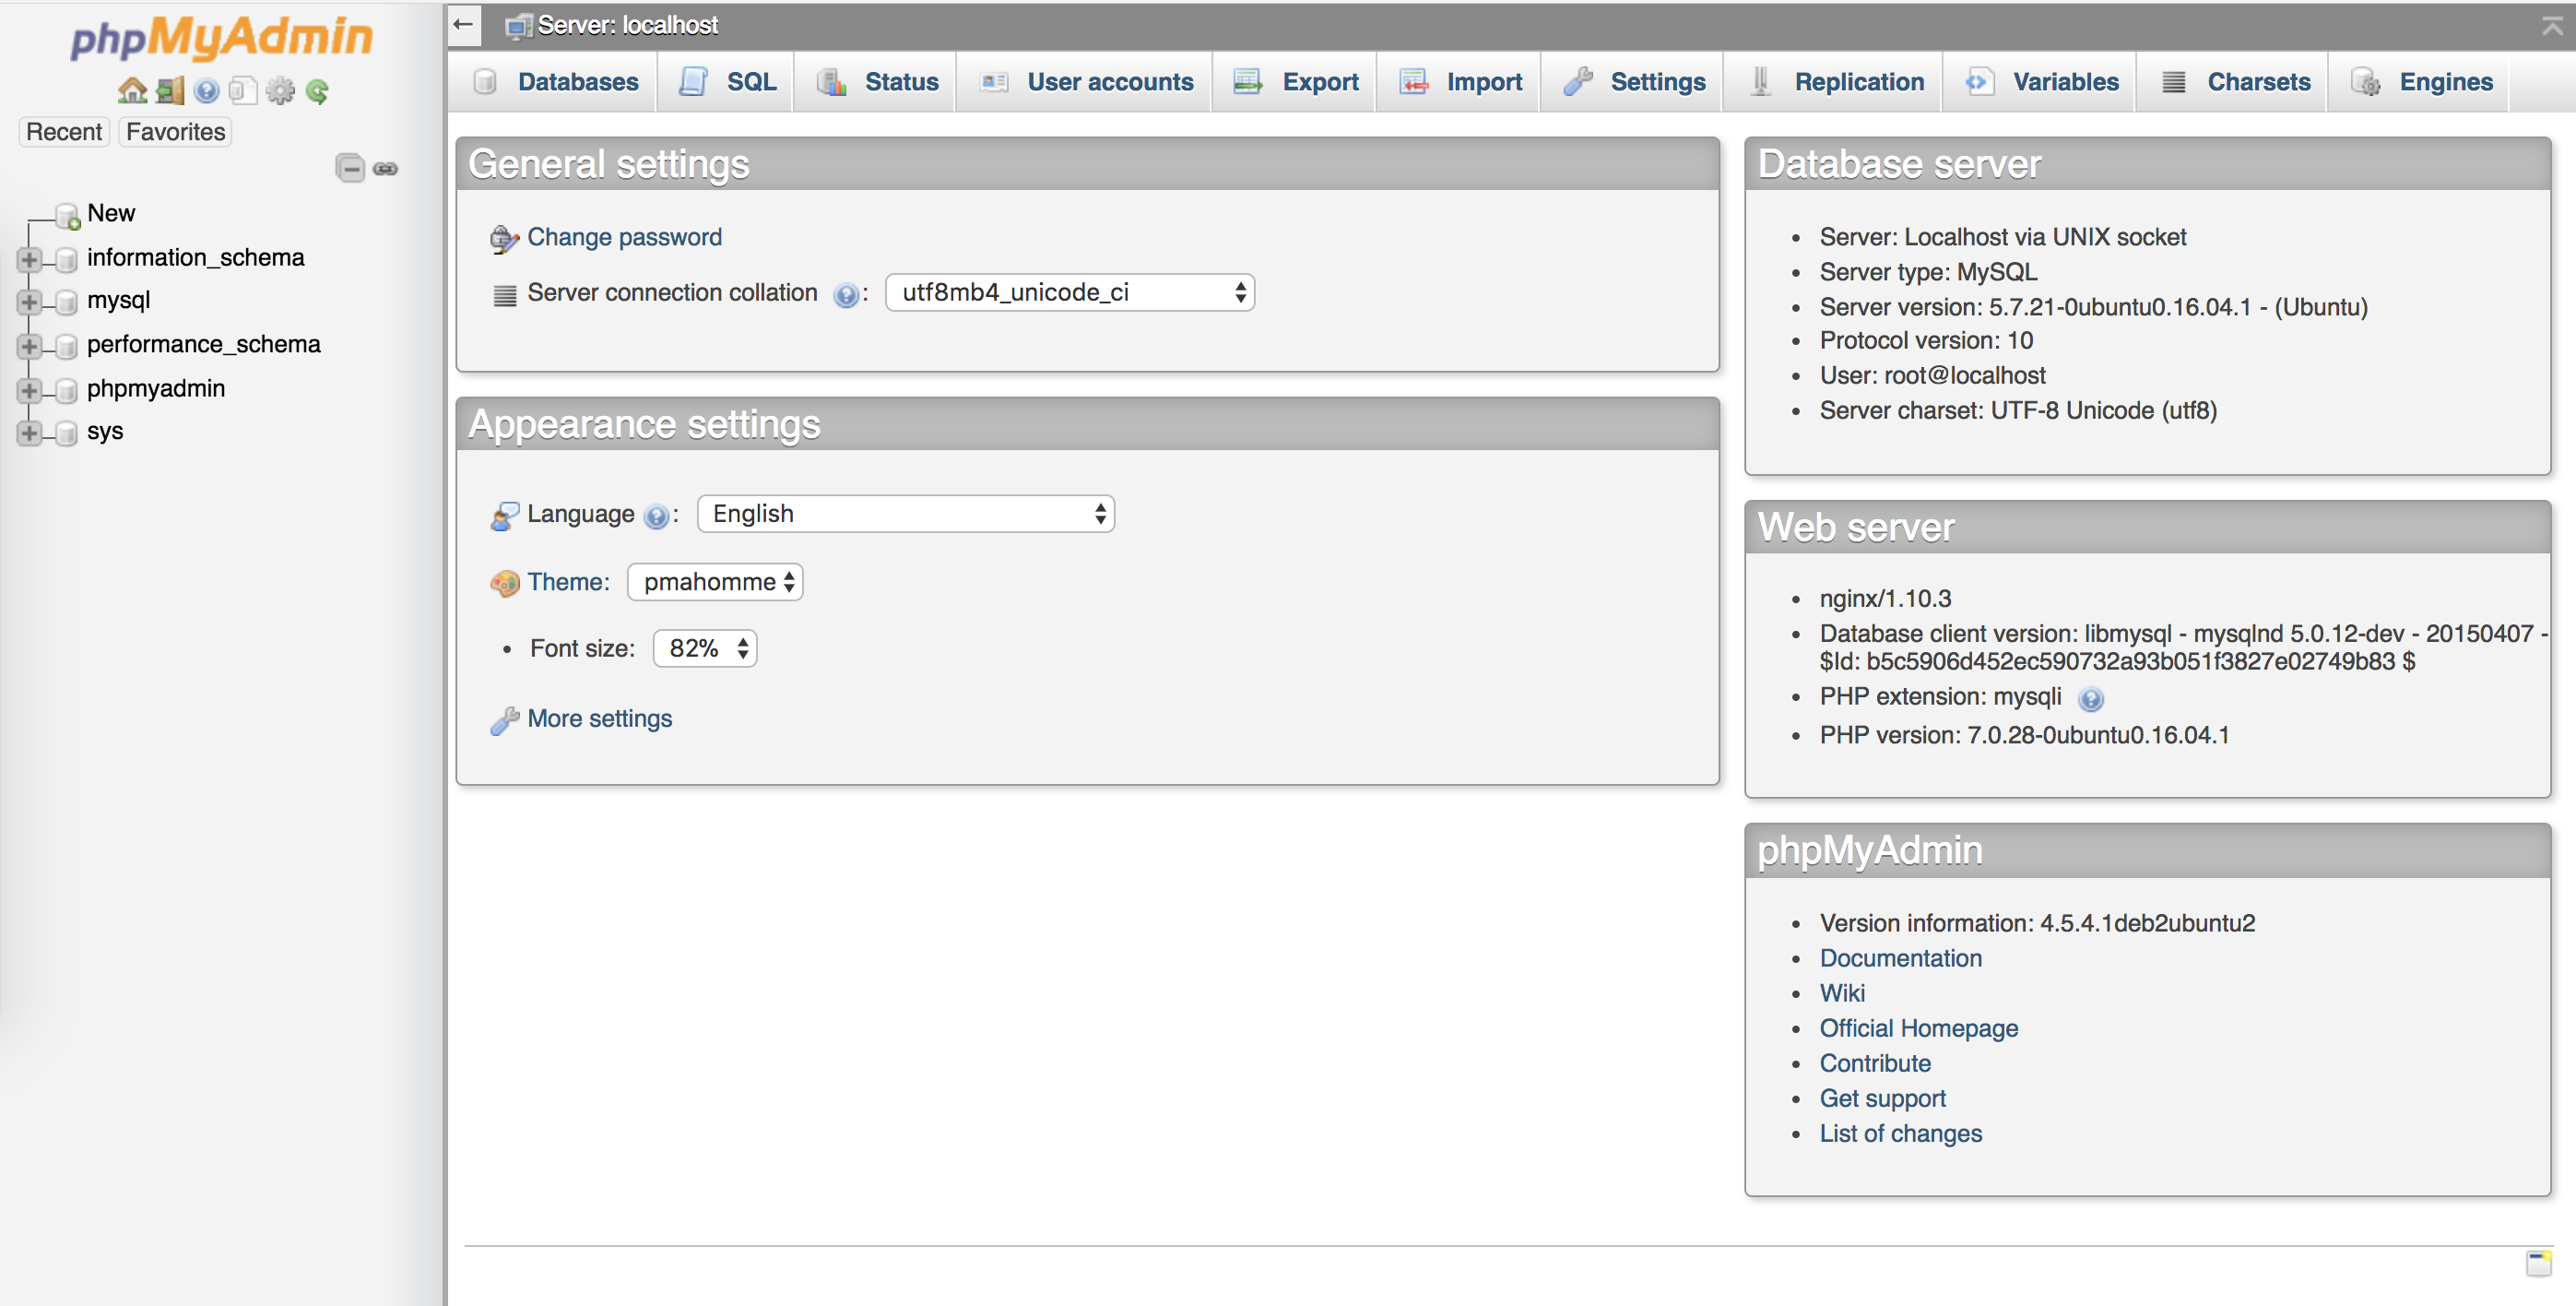 phpMyAdmin admin interface